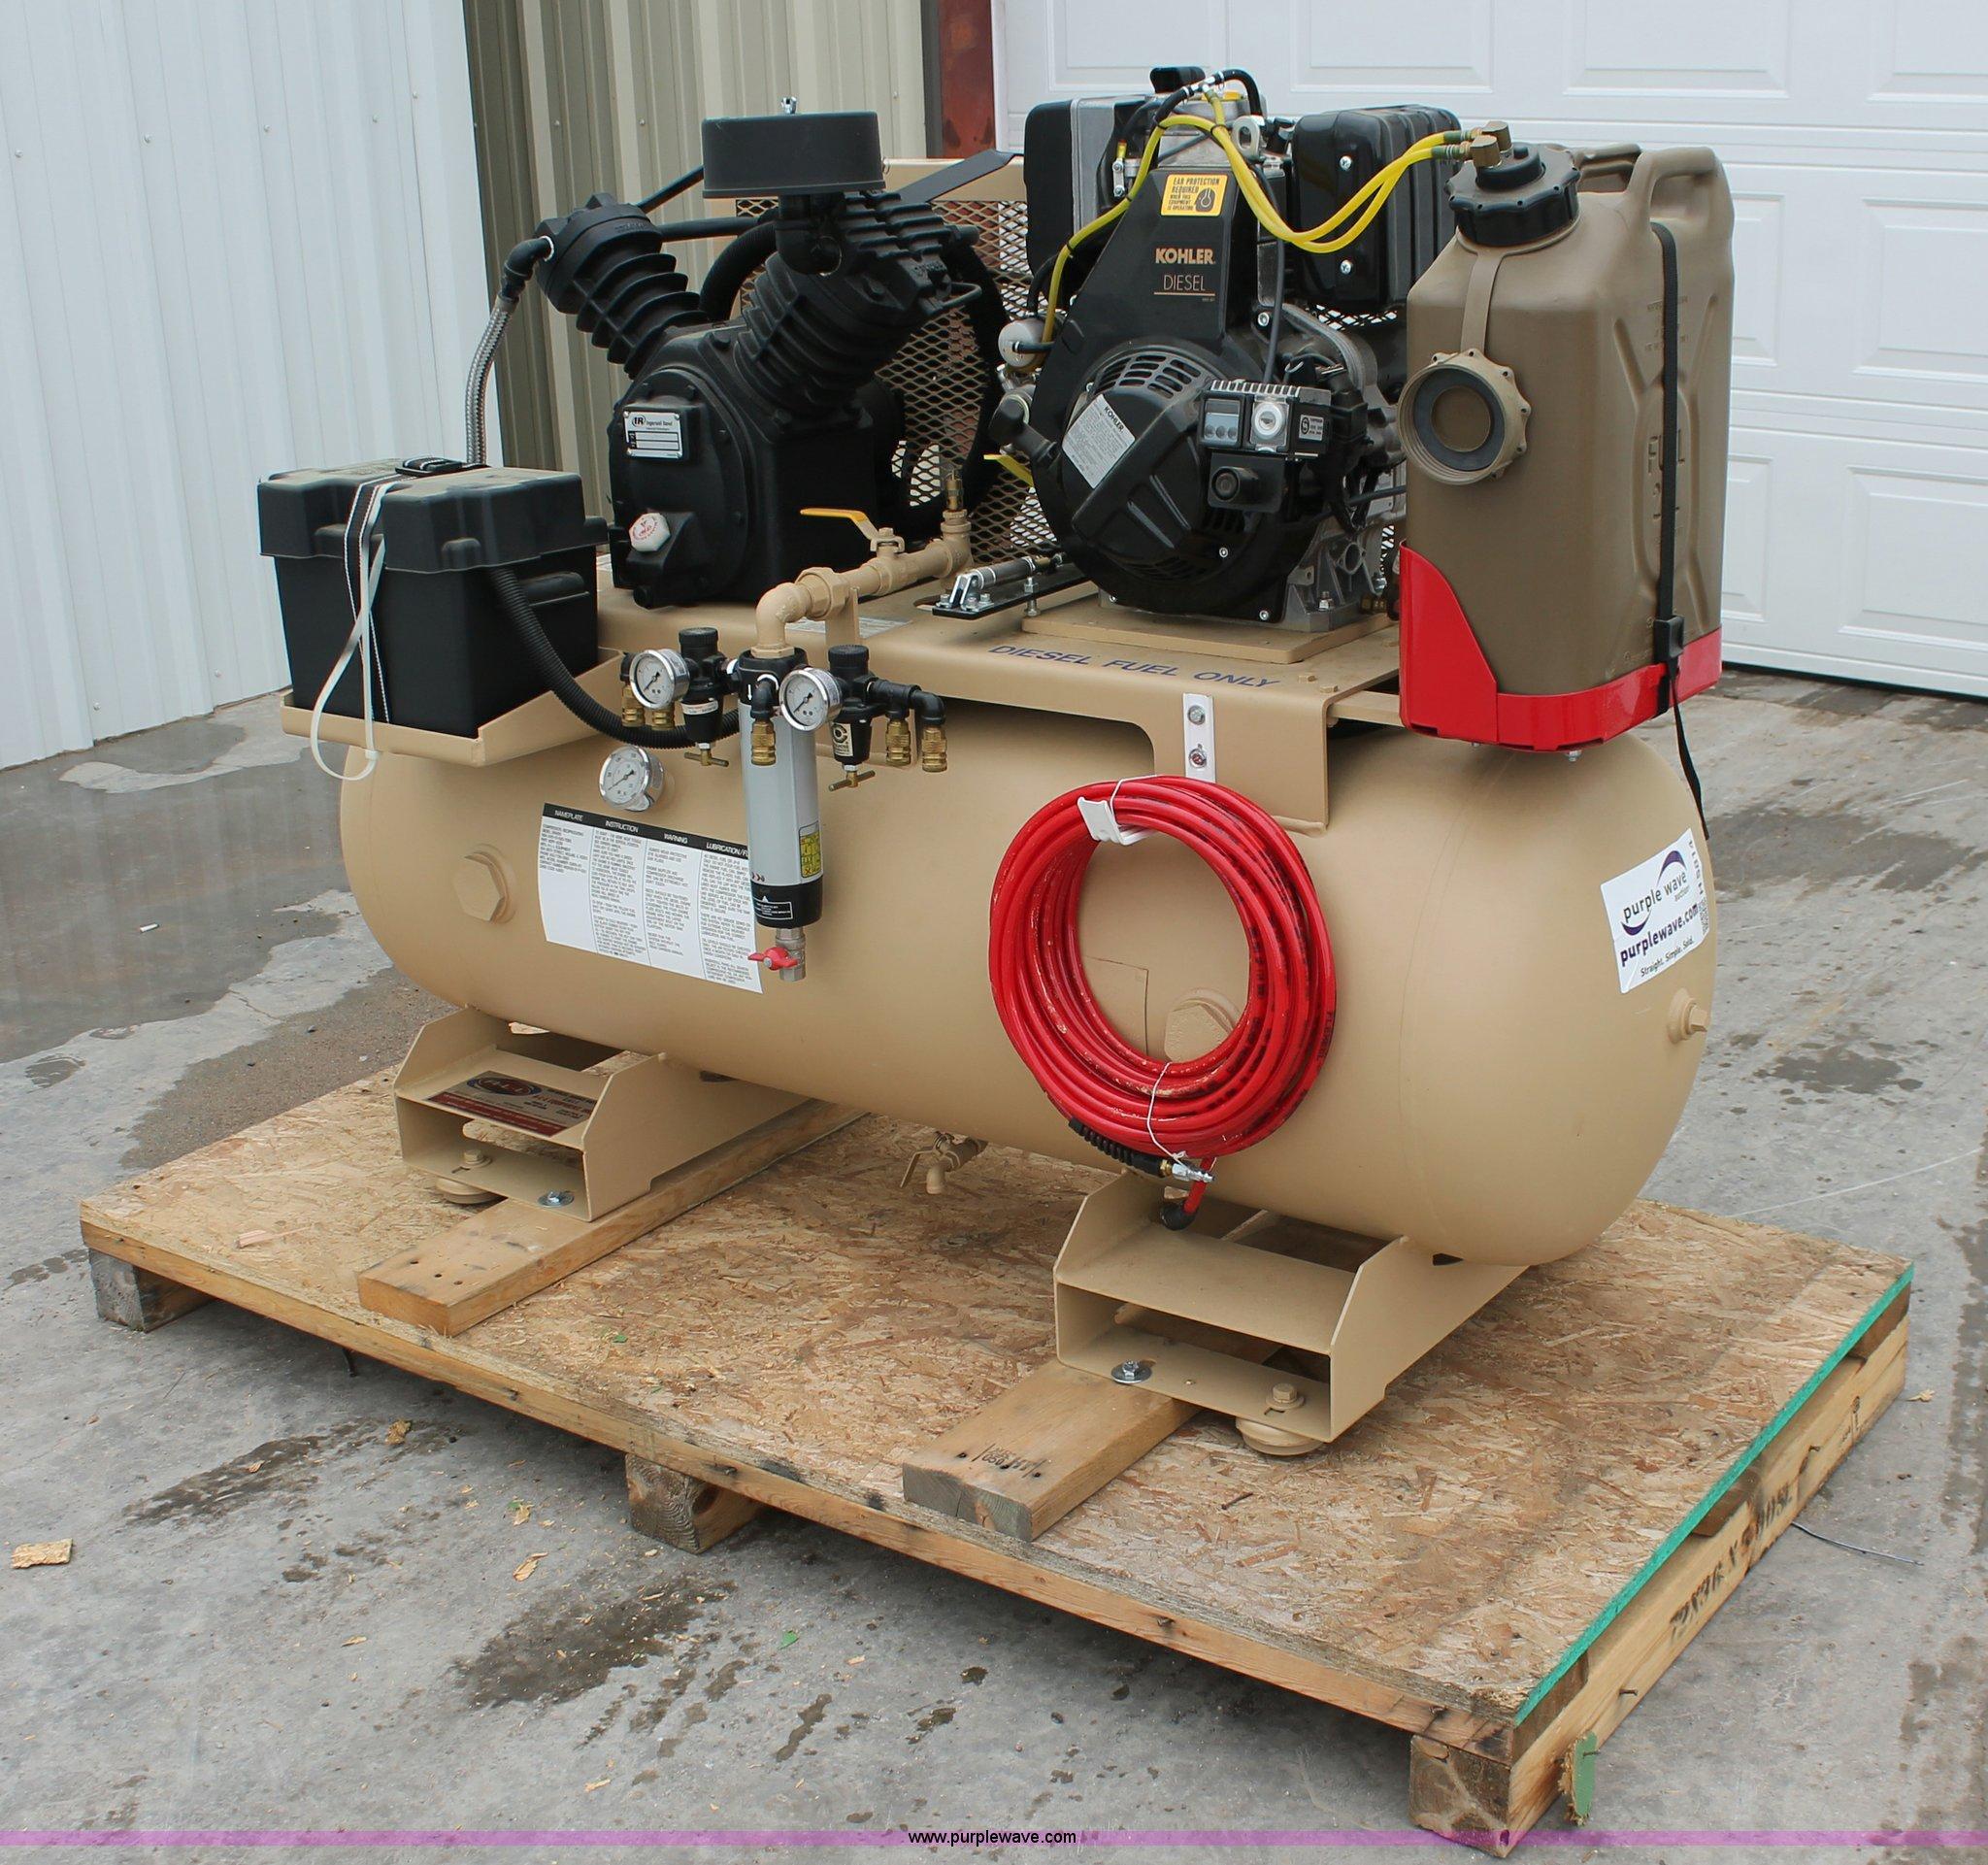 L6842 image for item L6842 Ingersoll Rand 2475 air compressor